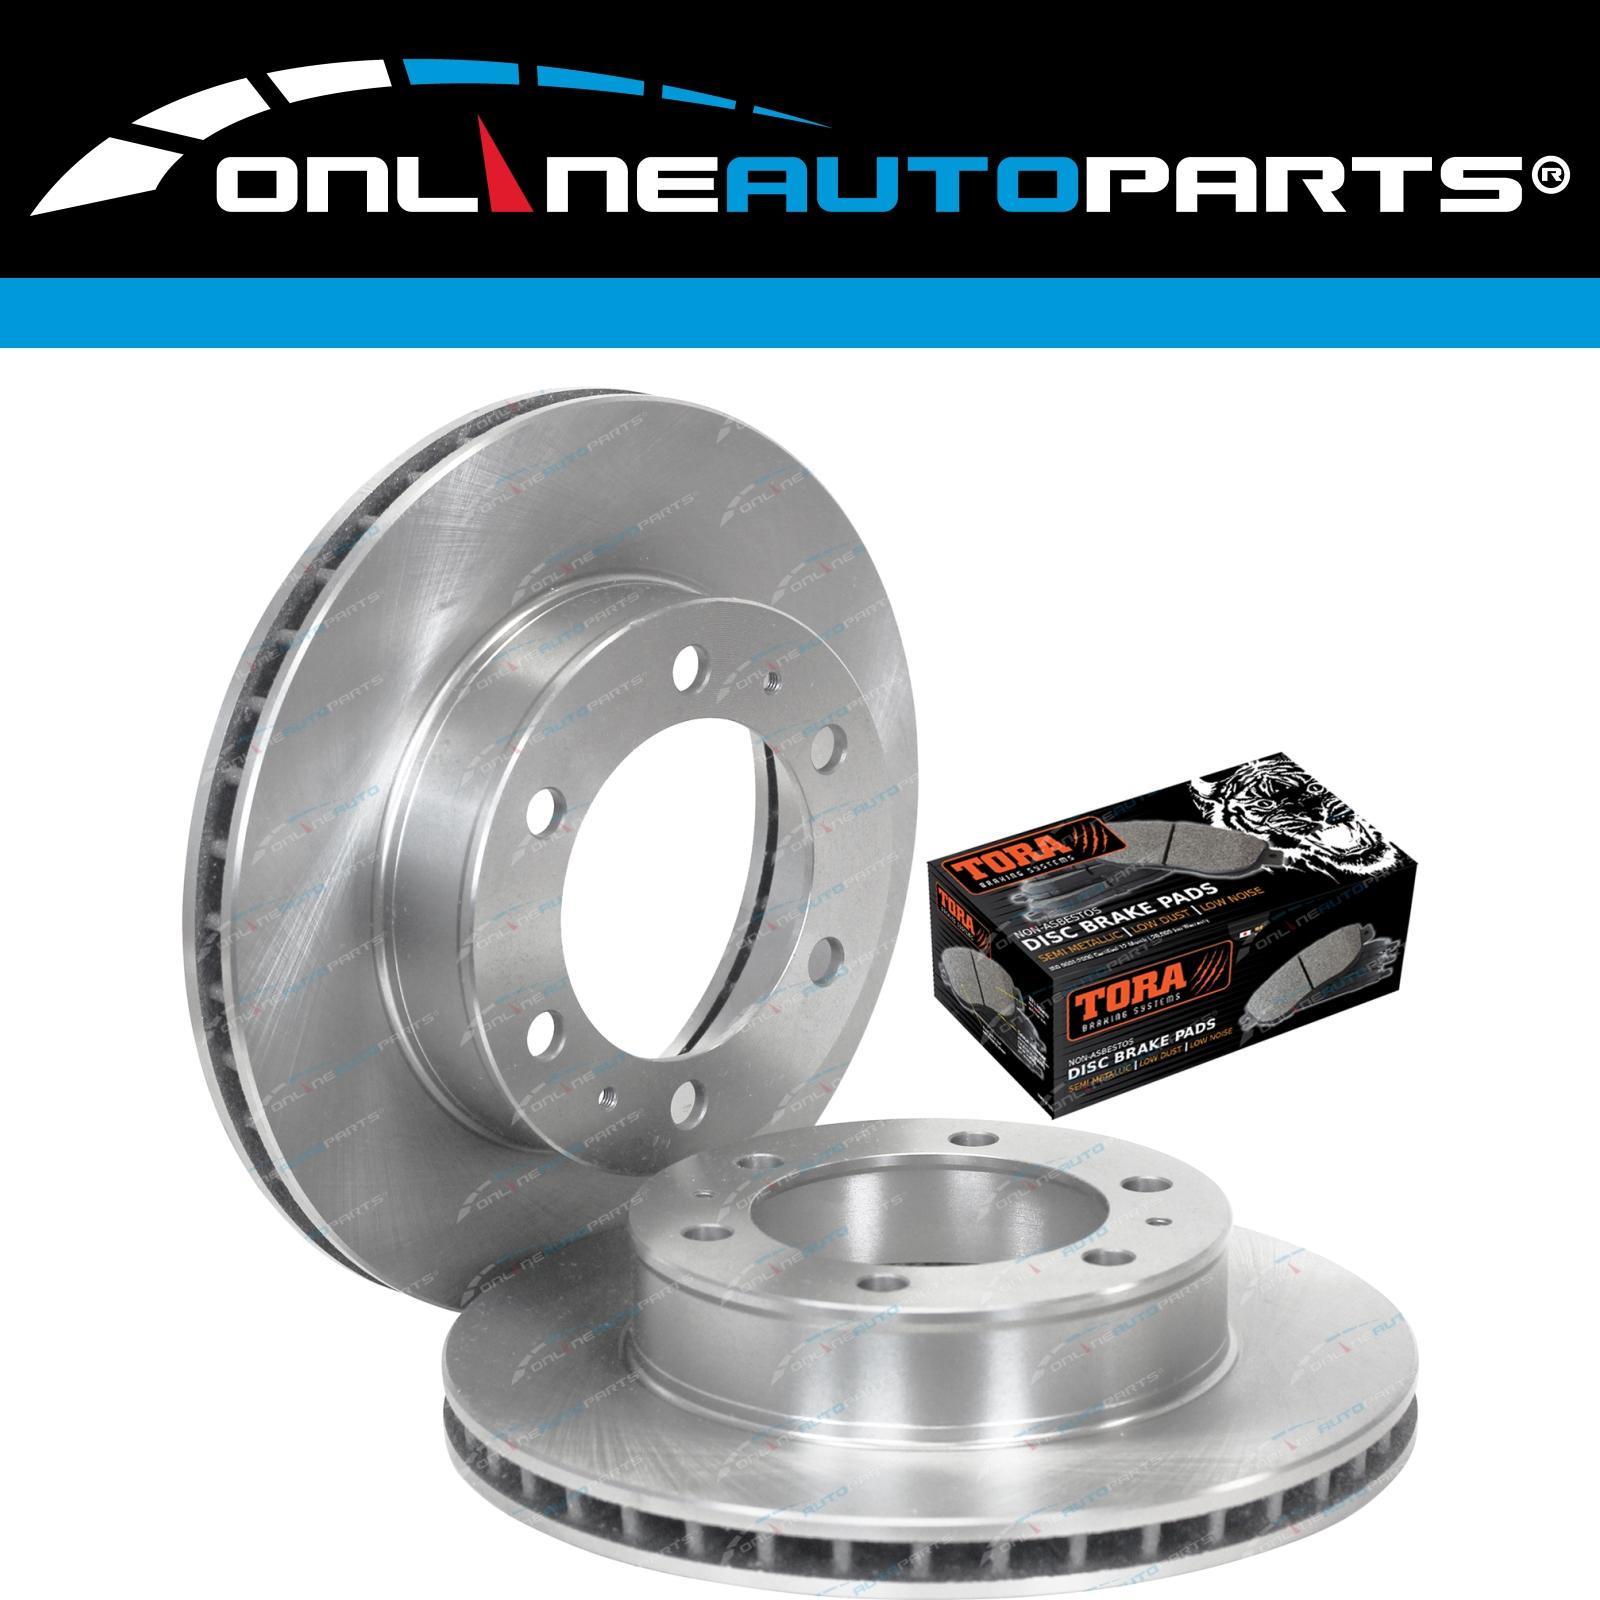 Pads Kit suits Hilux GGN25 KUN25 KUN26 TGN26 05~16 4X4 Front Disc Brake Rotors